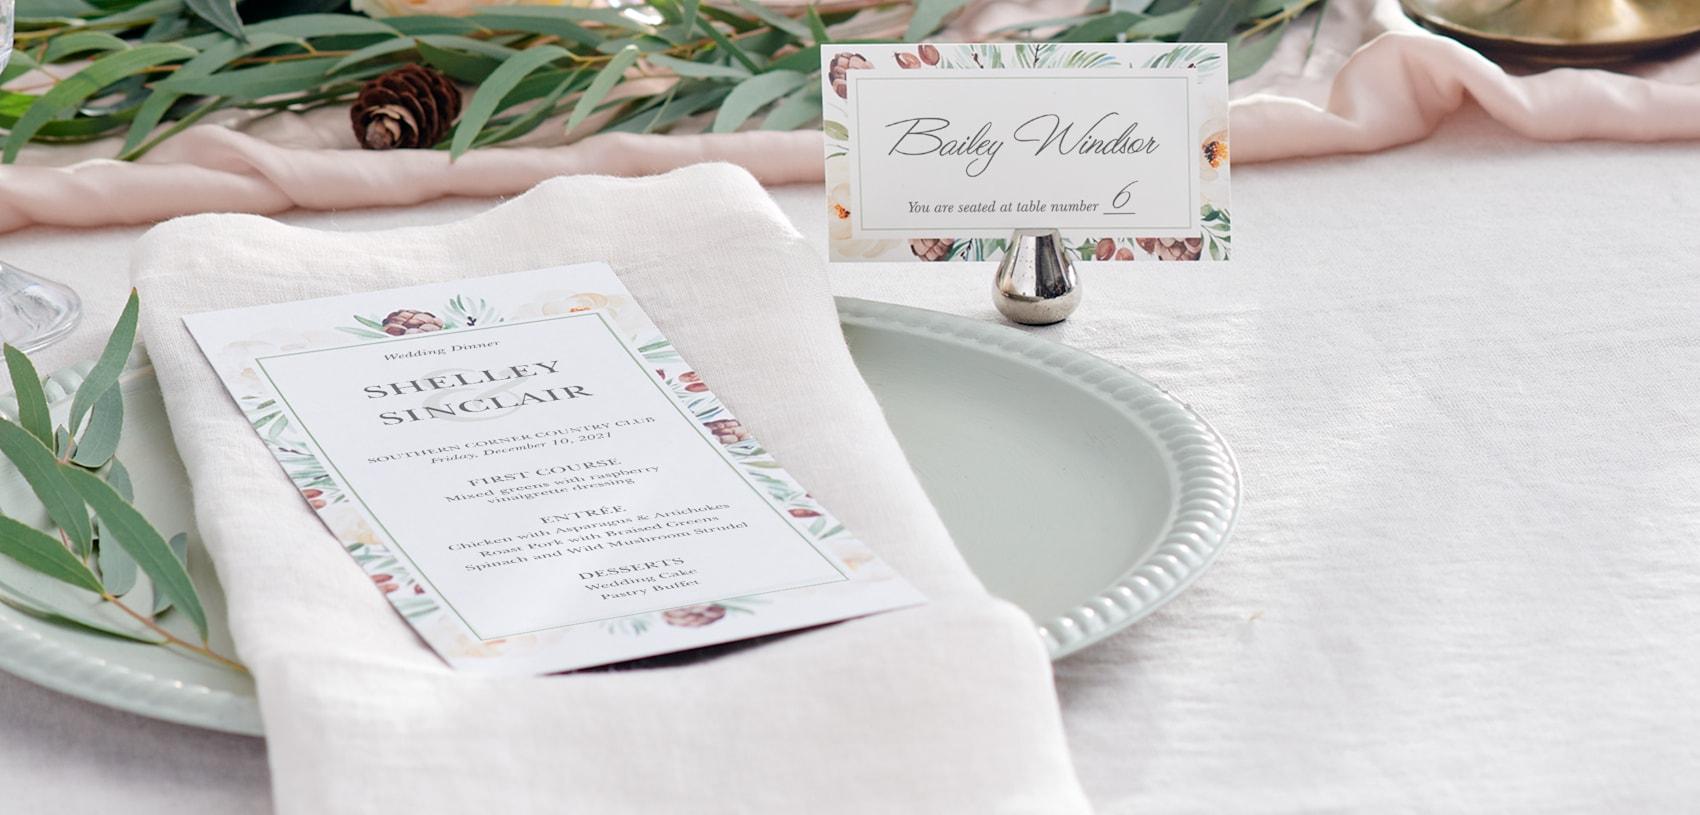 wedding menus with floral design